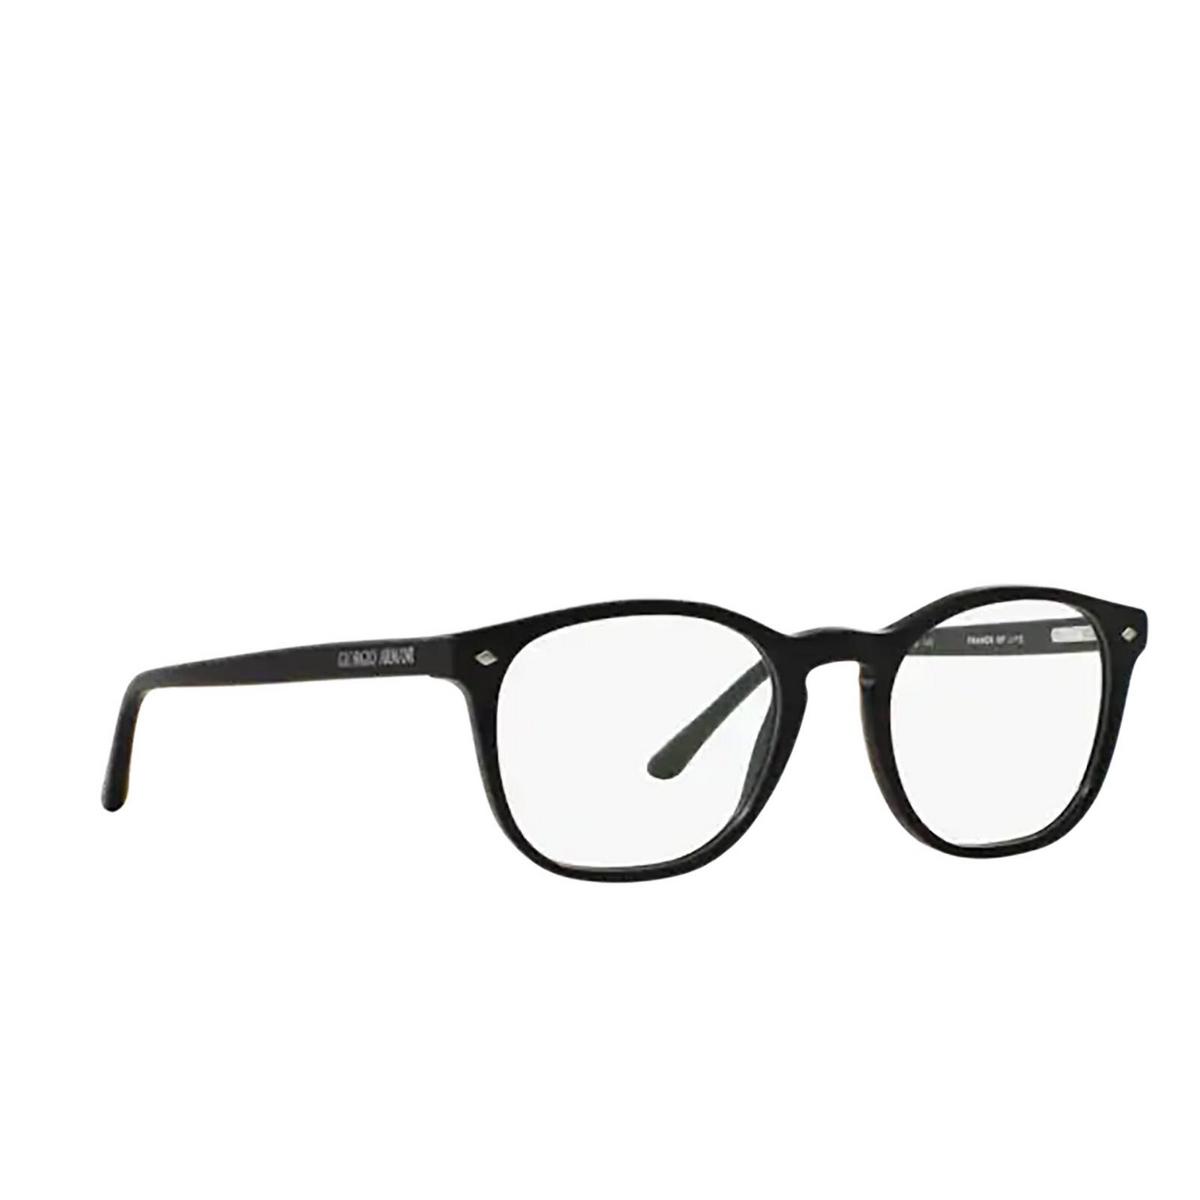 Giorgio Armani® Round Eyeglasses: AR7074 color Matte Black 5042 - three-quarters view.